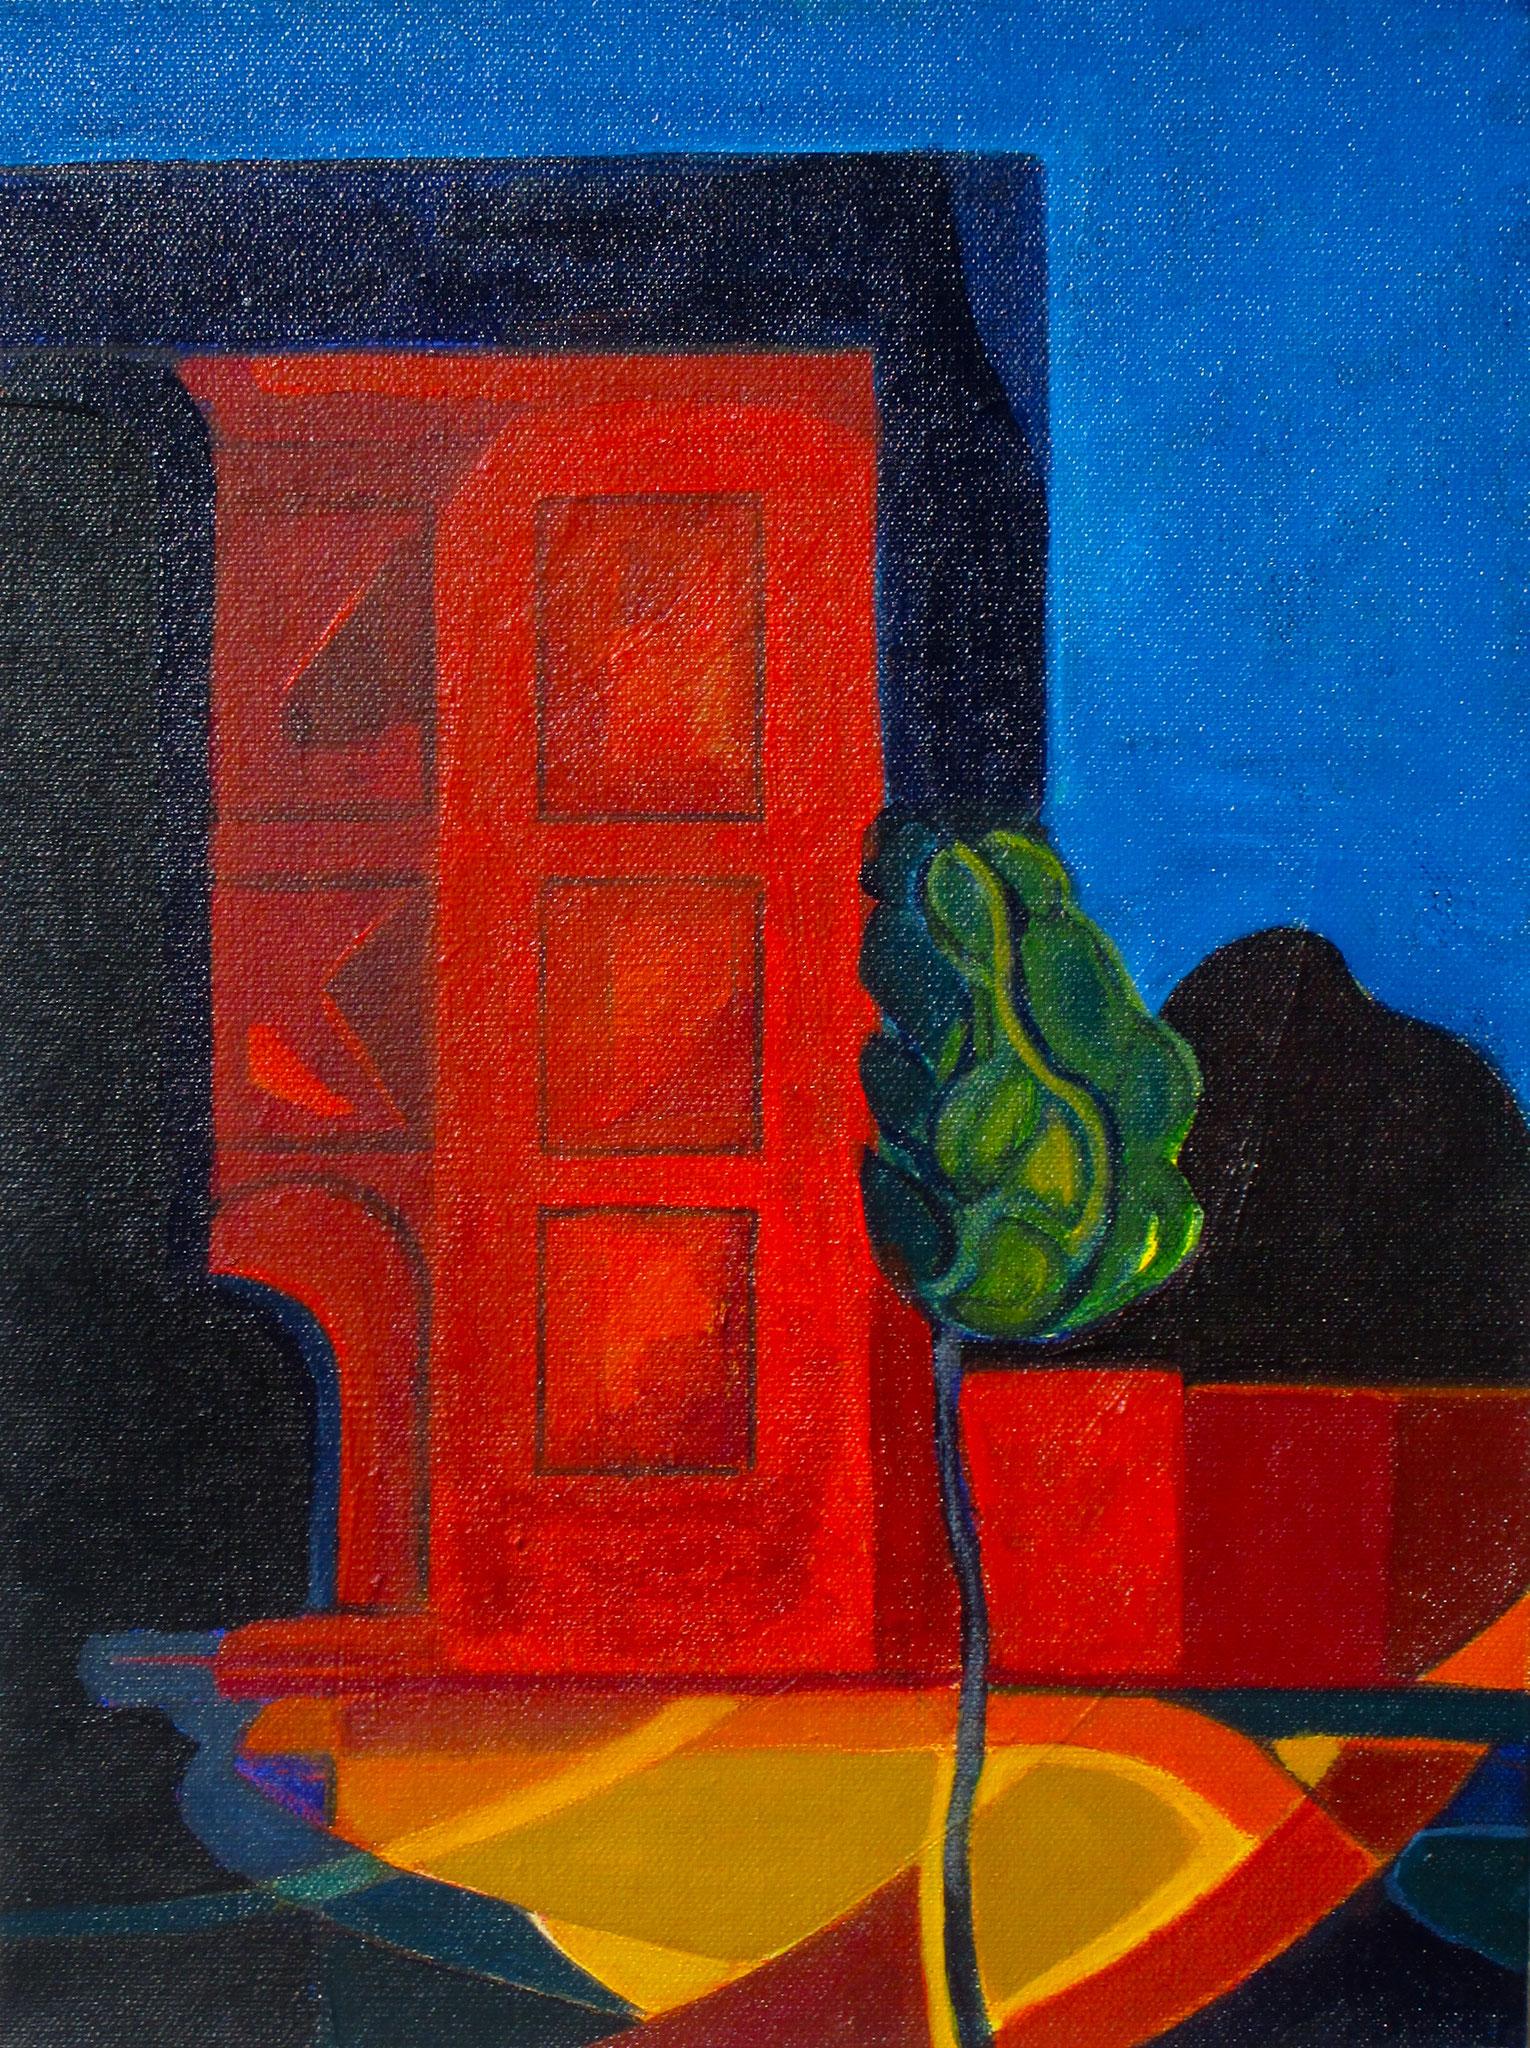 Indigo Night, acrylic on canvas, 12 x 16